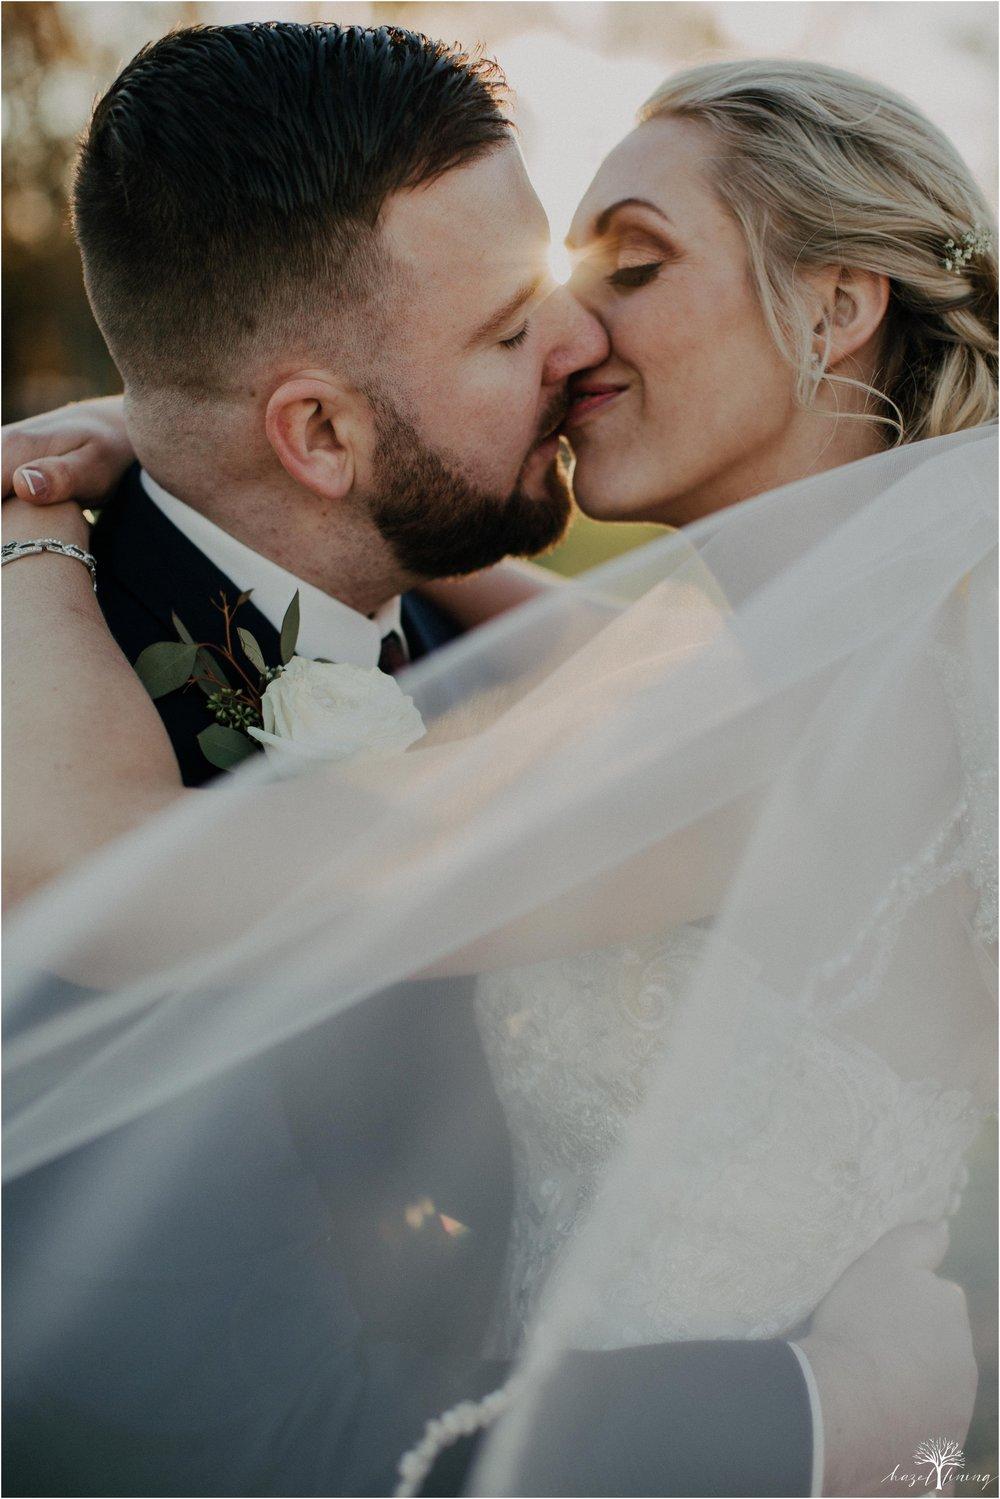 briana-krans-greg-johnston-farm-bakery-and-events-fall-wedding_0123.jpg